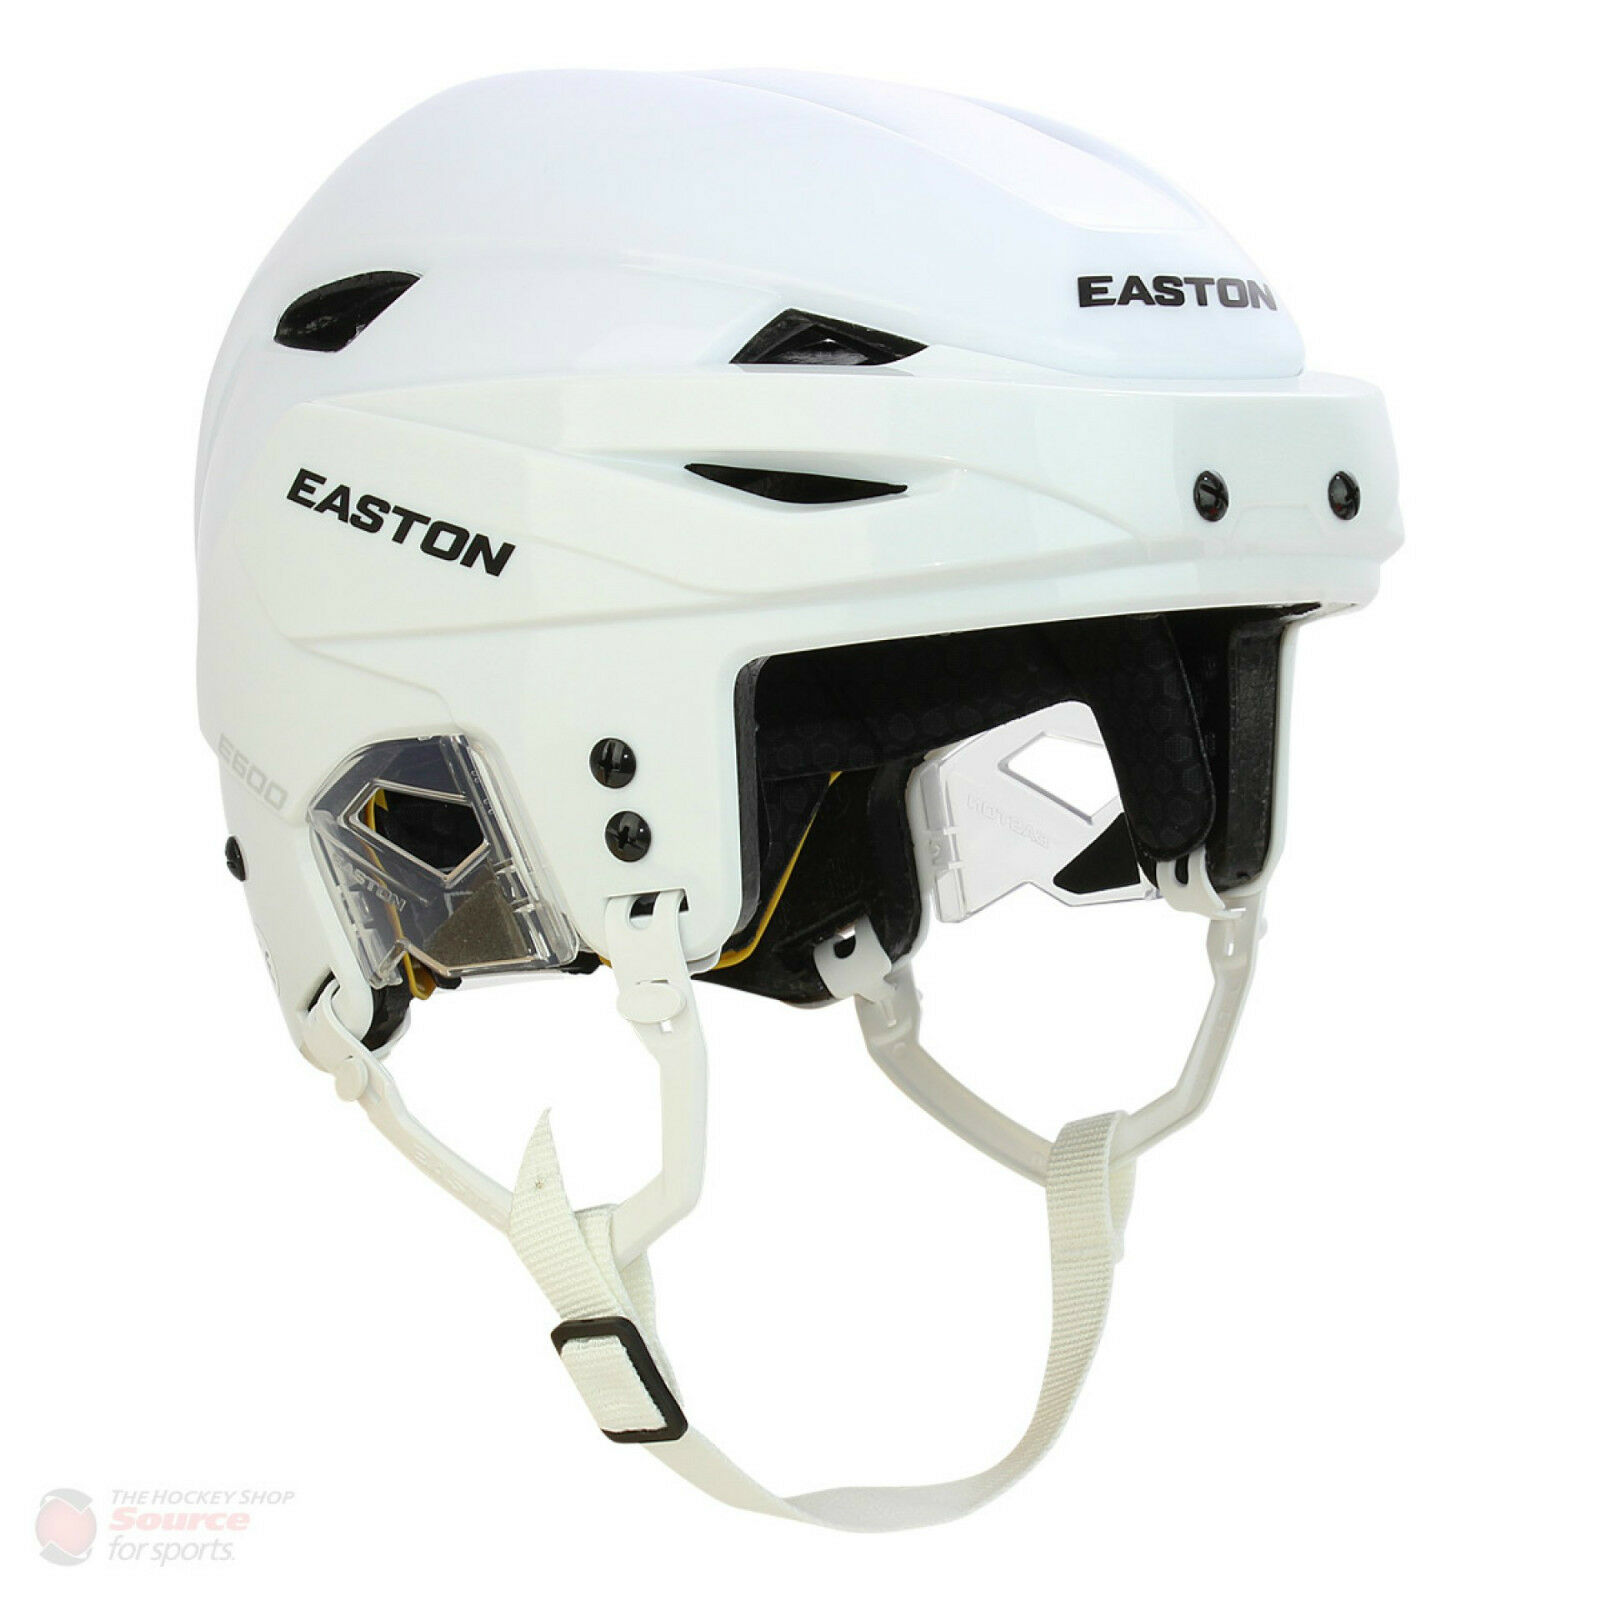 Easton E600 Helm (Senior L - Weiss)